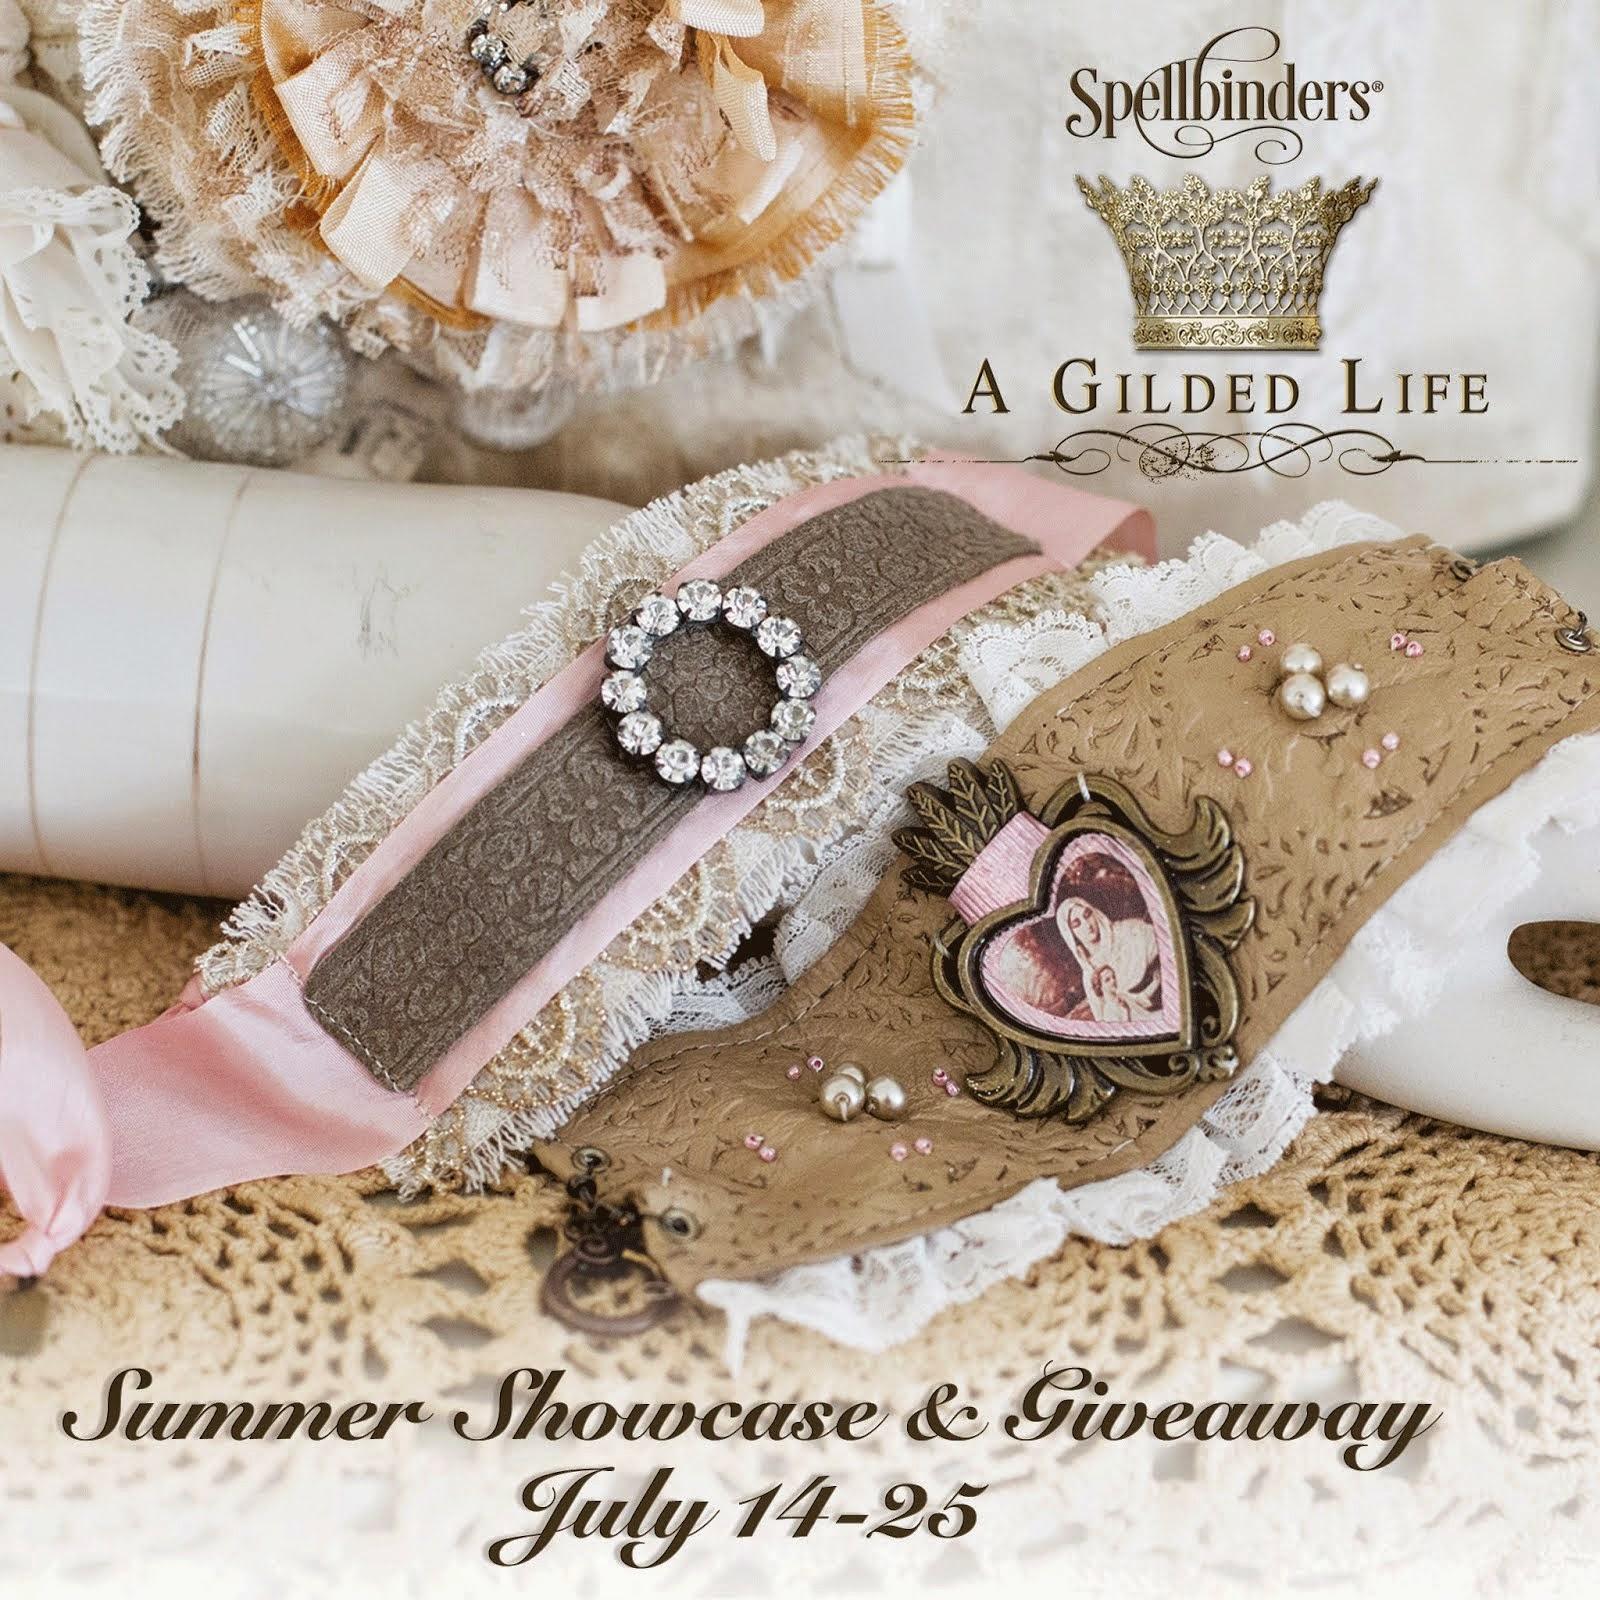 Spellbinders/A Gilded Life Summer Showcase